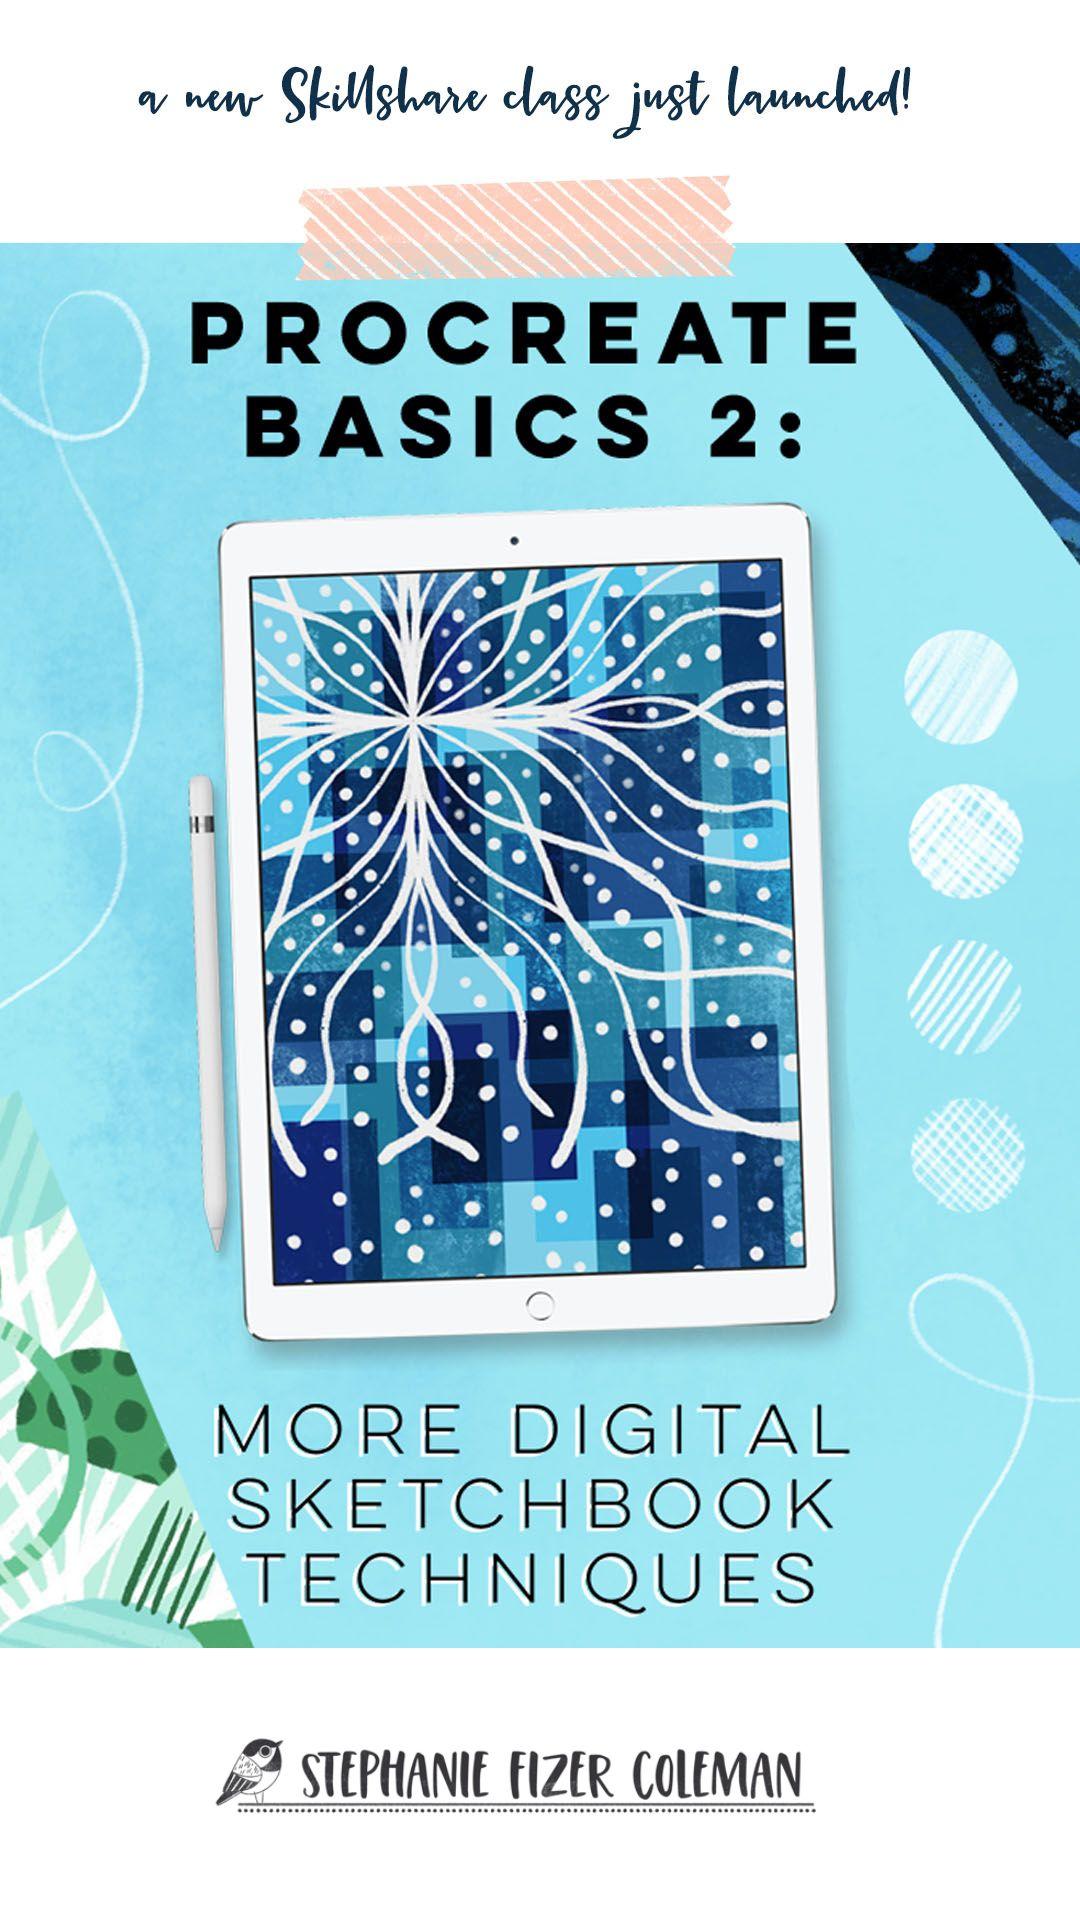 Procreate Basics 2: More Digital Sketchbook Techniques is my brand